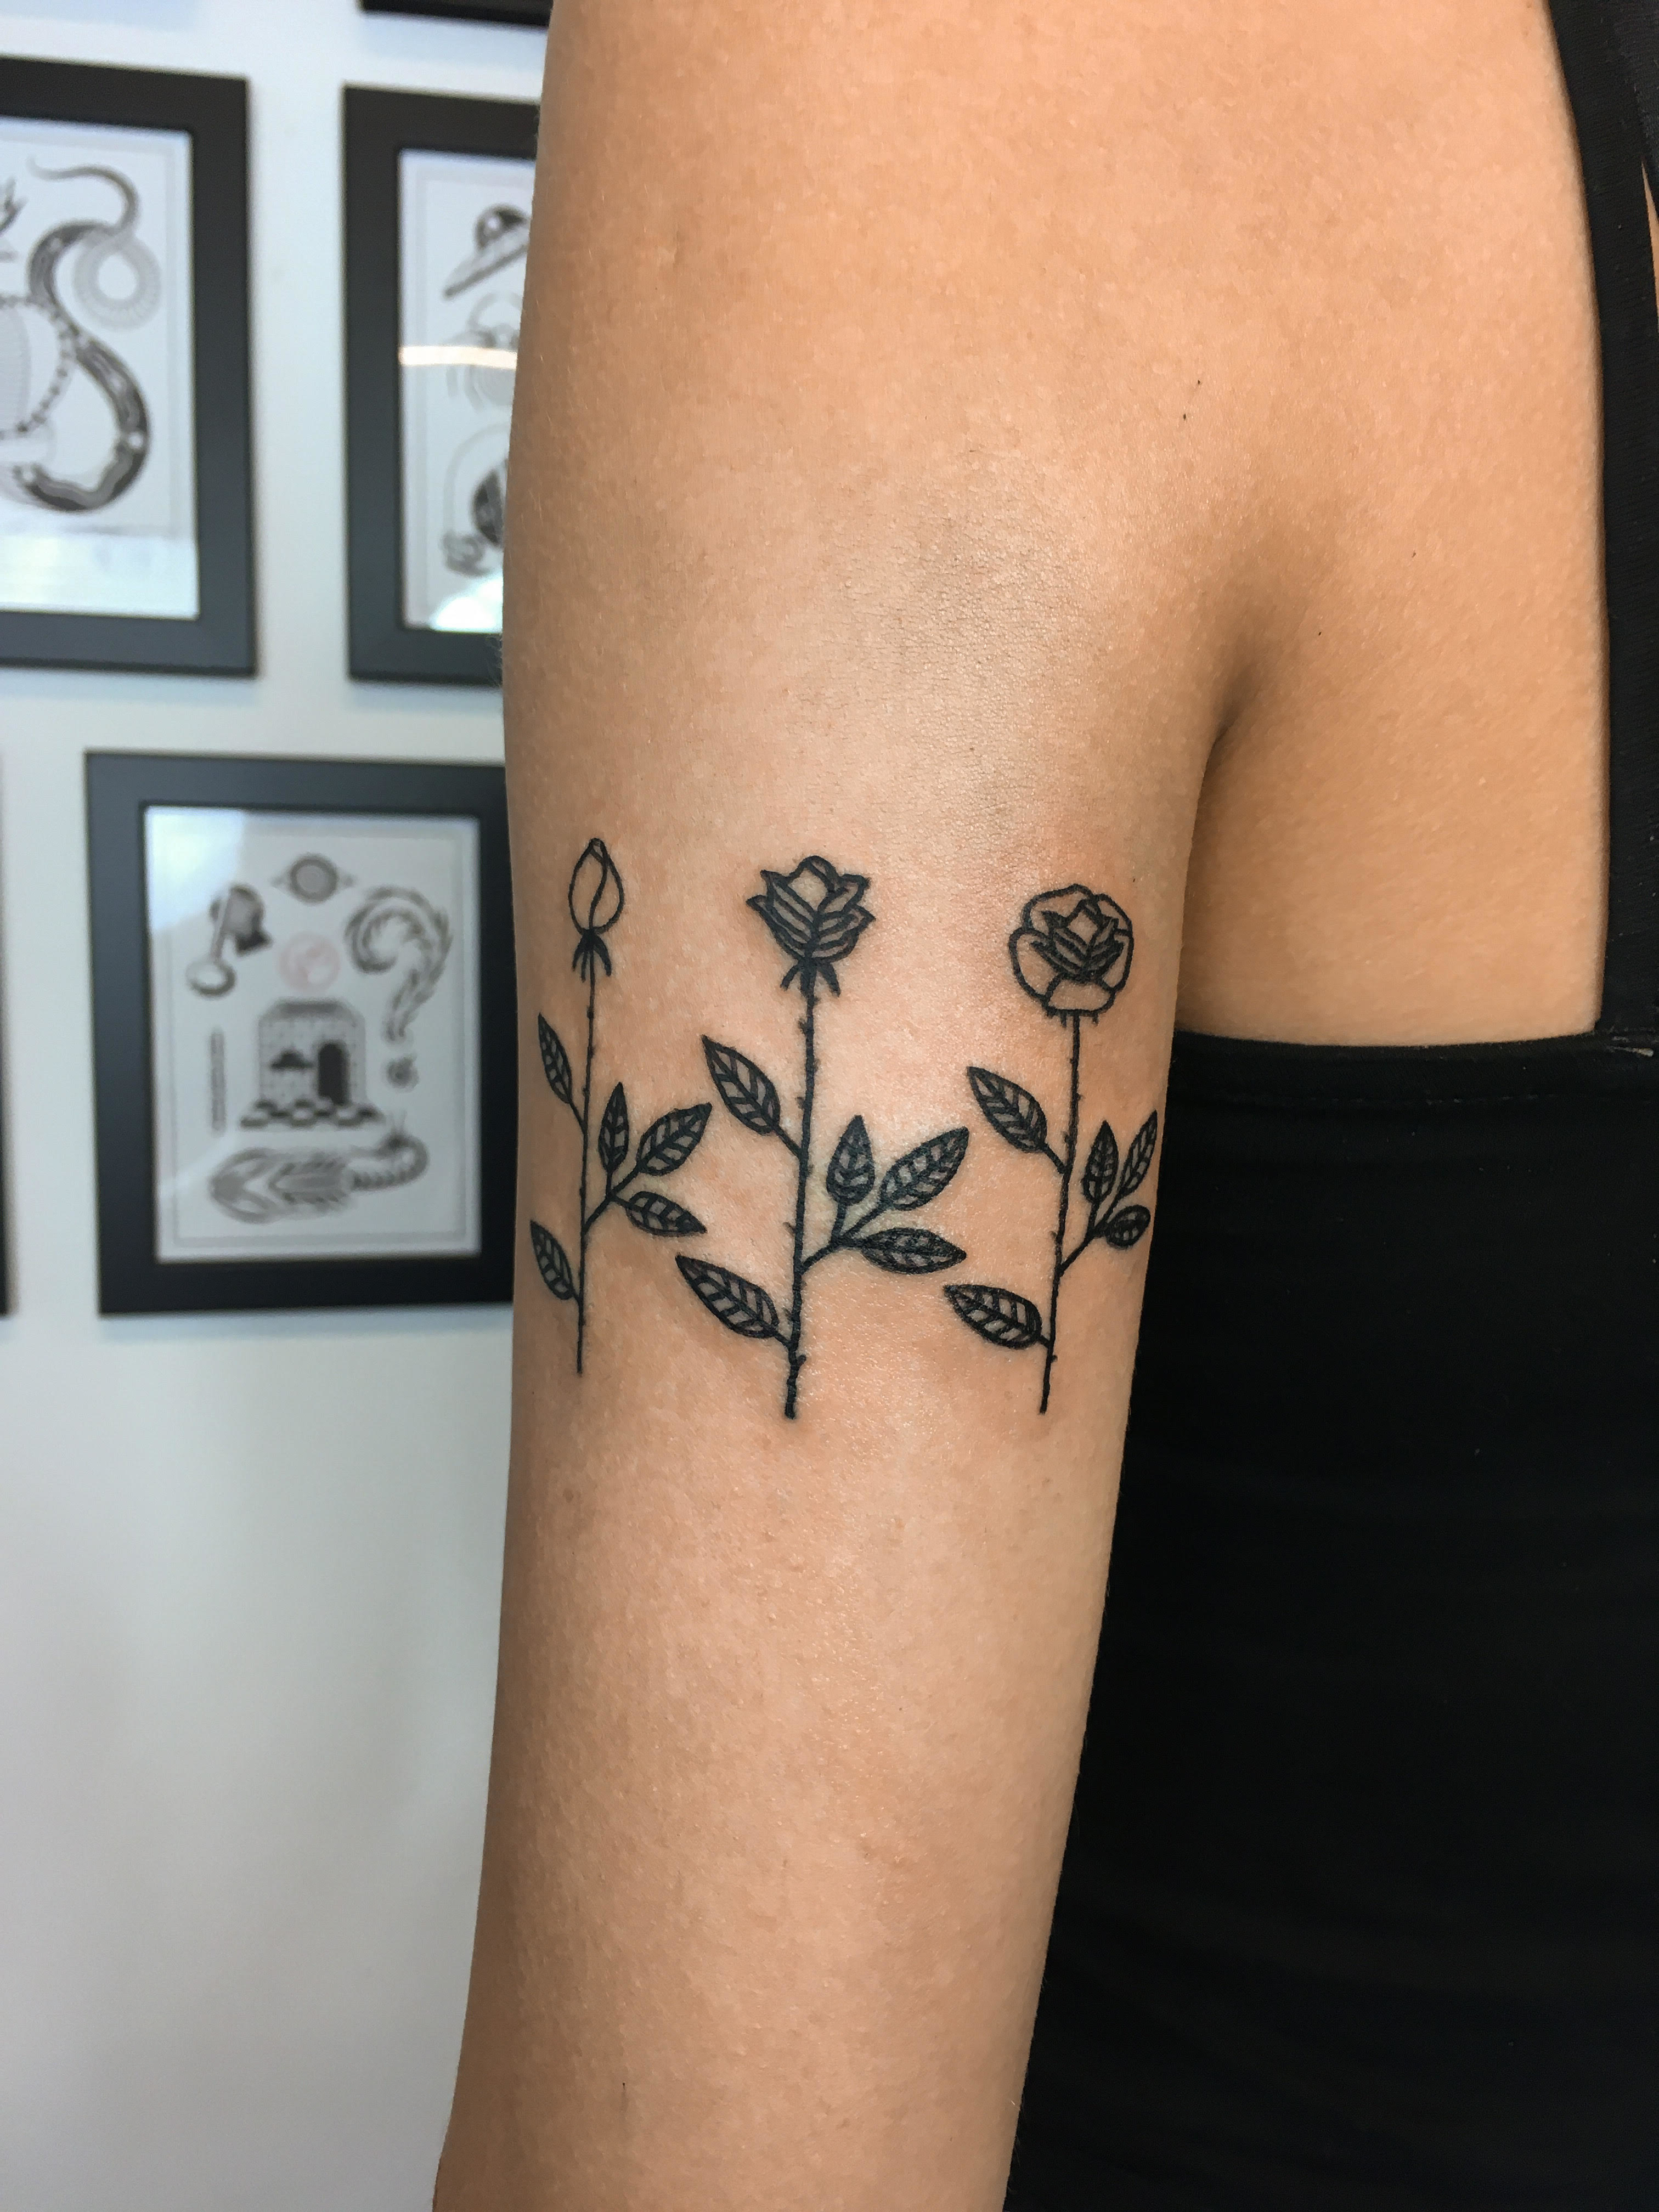 Inksearch tattoo Anastasija Sinkewycz - Sinitsatrad